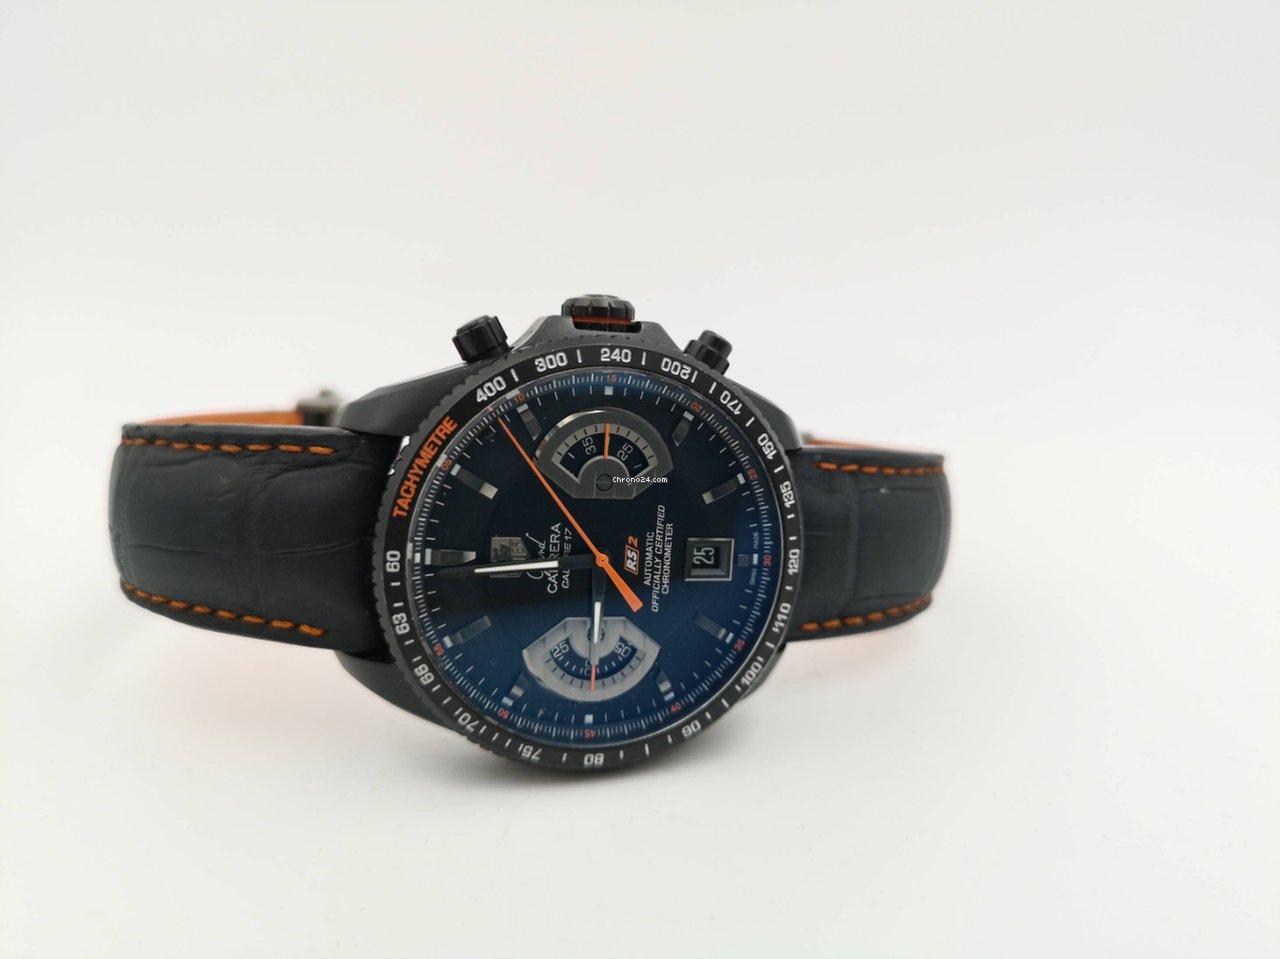 92a2c82655 Montres TAG Heuer Grand Carrera d'occasion | Acheter une montre TAG Heuer  Grand Carrera d'occasion